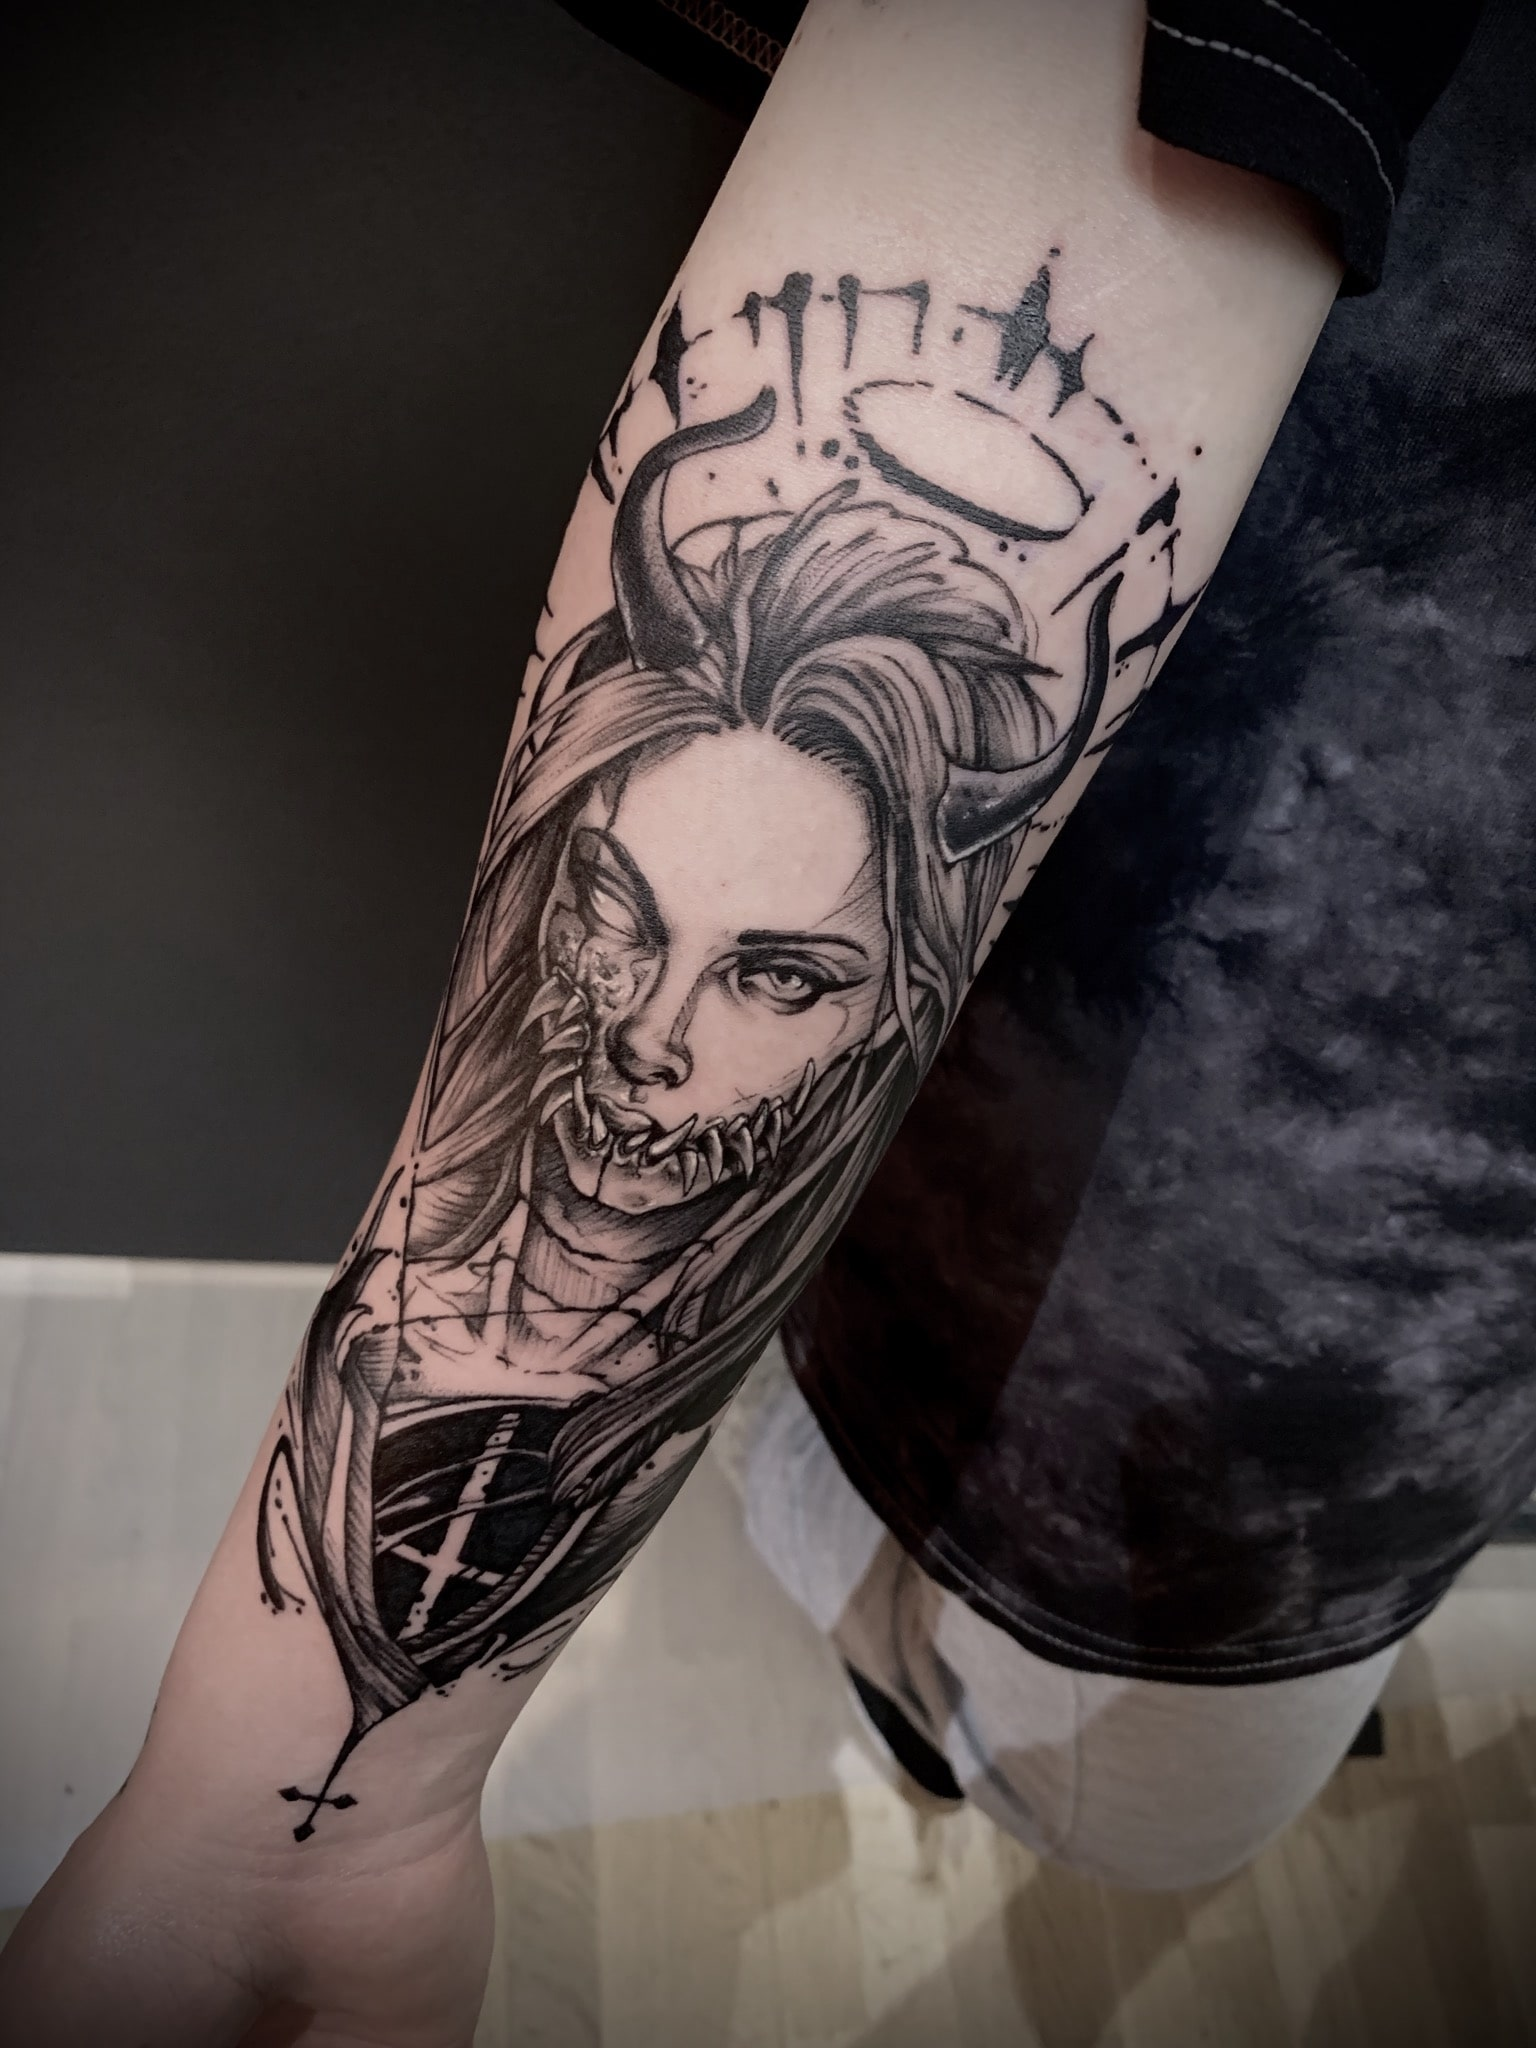 Tattoo Anansi München Artist David blackwork portrait woman Frau demon Dämon devil angel